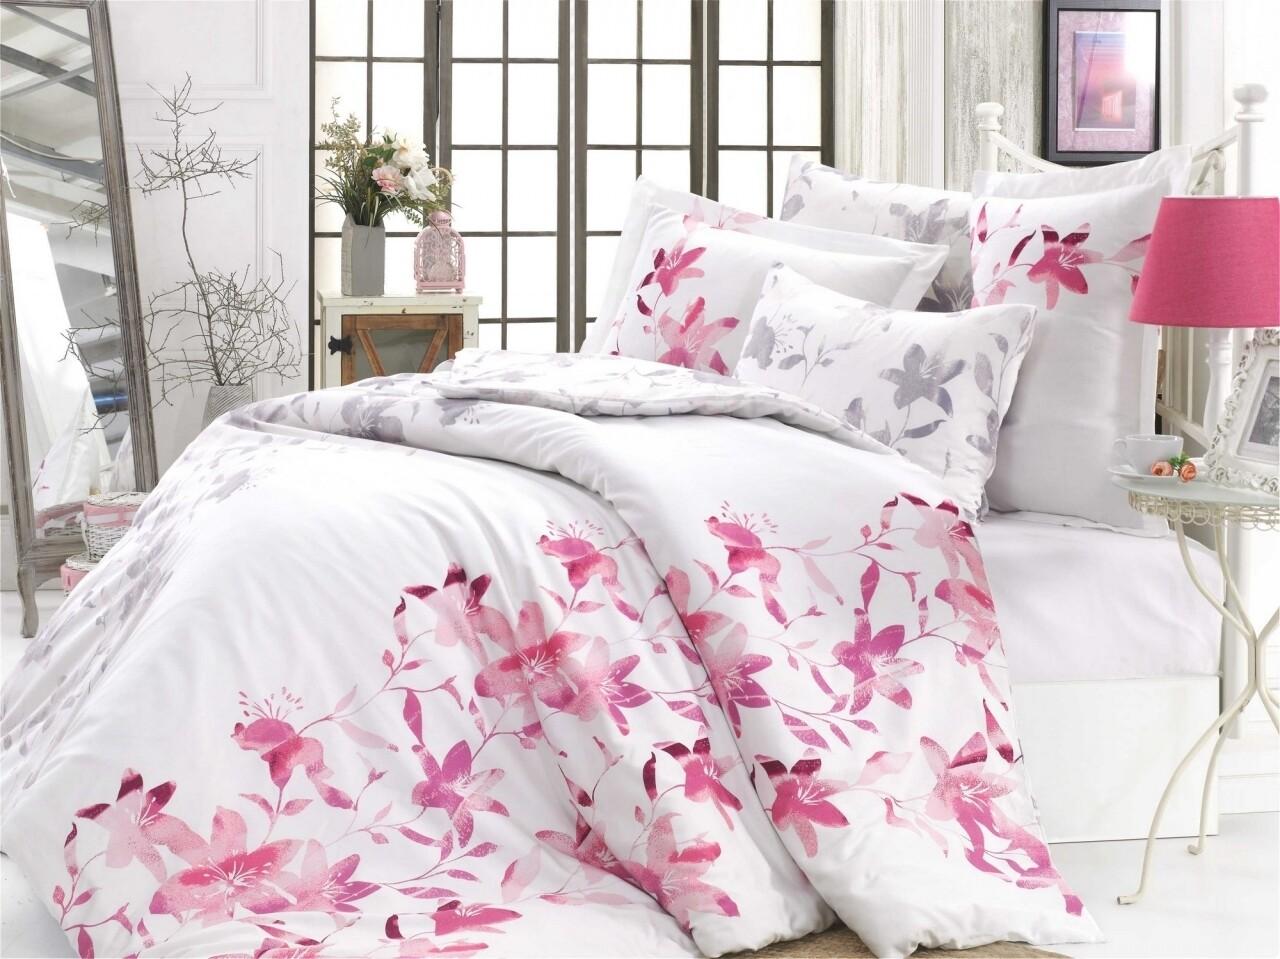 Lenjerie de pat dubla, 6 piese, 240x260 cm, 100% bumbac satinat, Hobby, Lucia Fuchsia, alb/roz